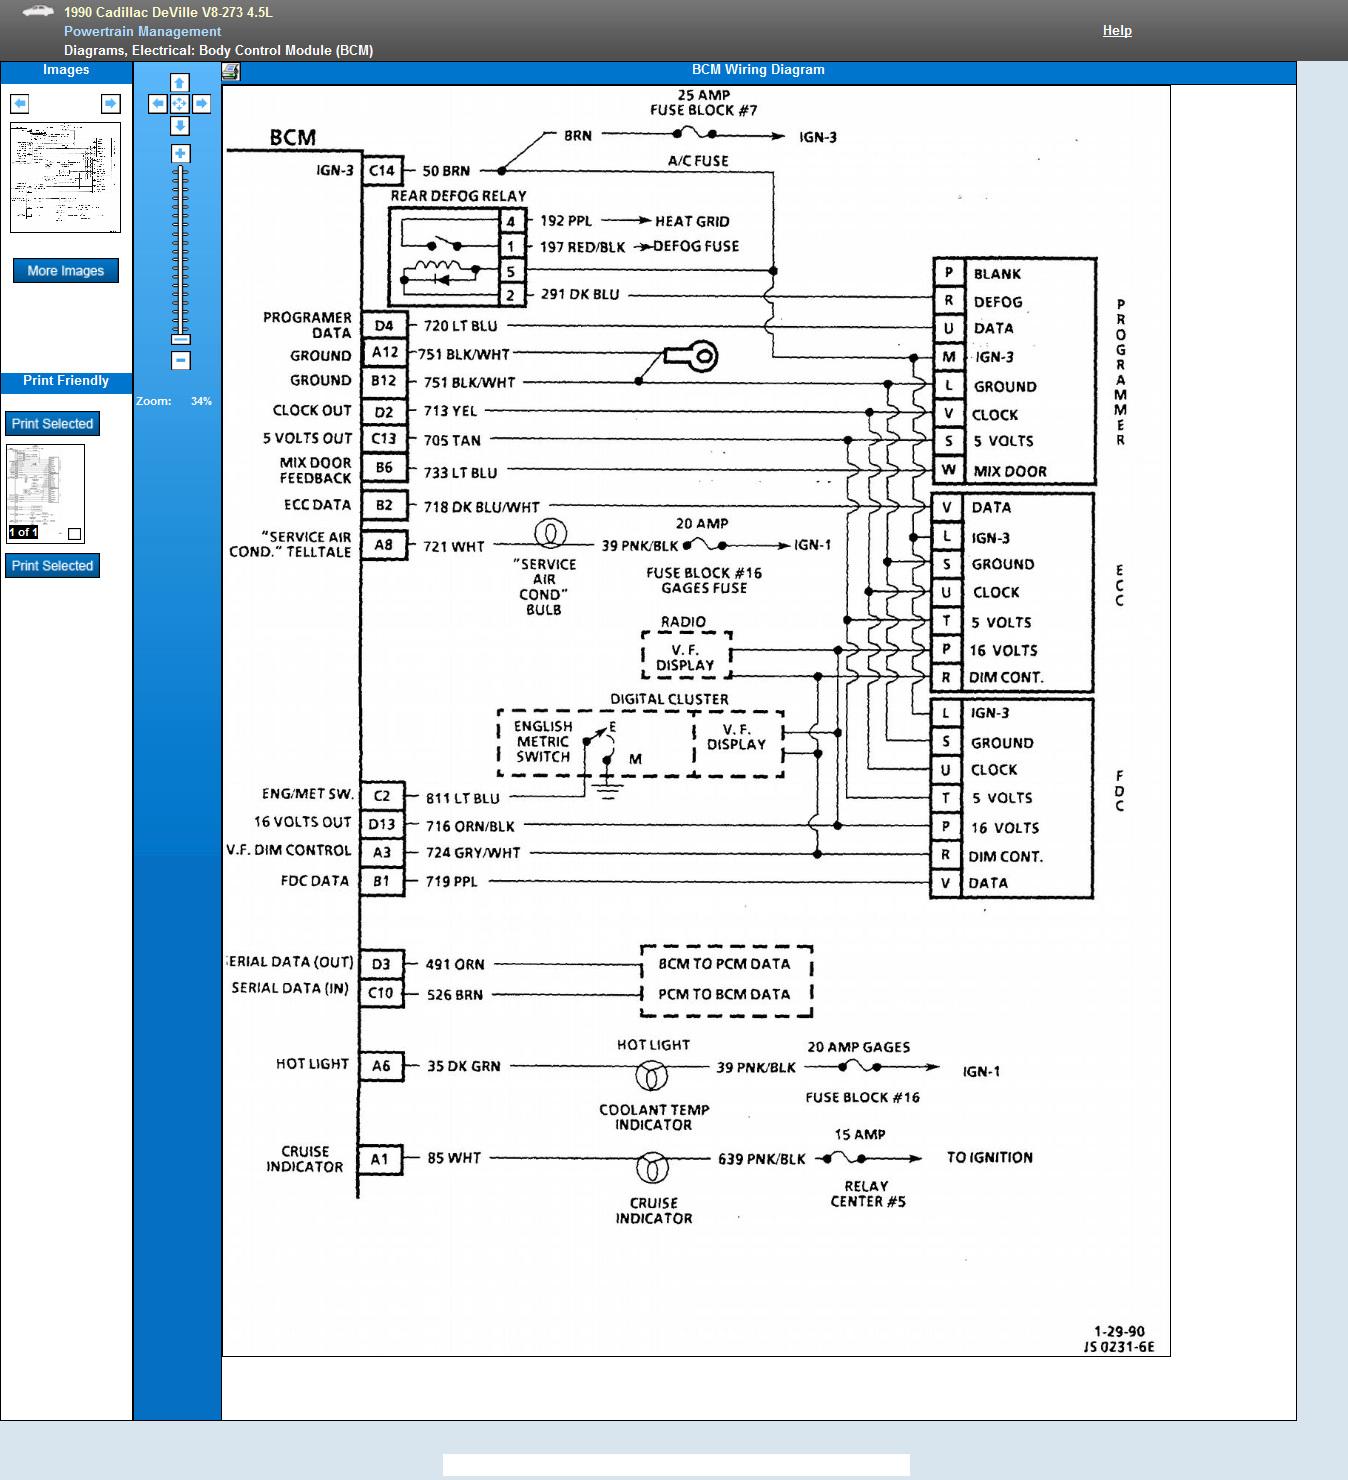 Escalade Bcm Wiring Diagram - 4t40e Wiring Diagram -  contuor.nescafe.jeanjaures37.fr | Bcm Wiring Schematics 2007 Cadillac Escalade Ext |  | Wiring Diagram Resource